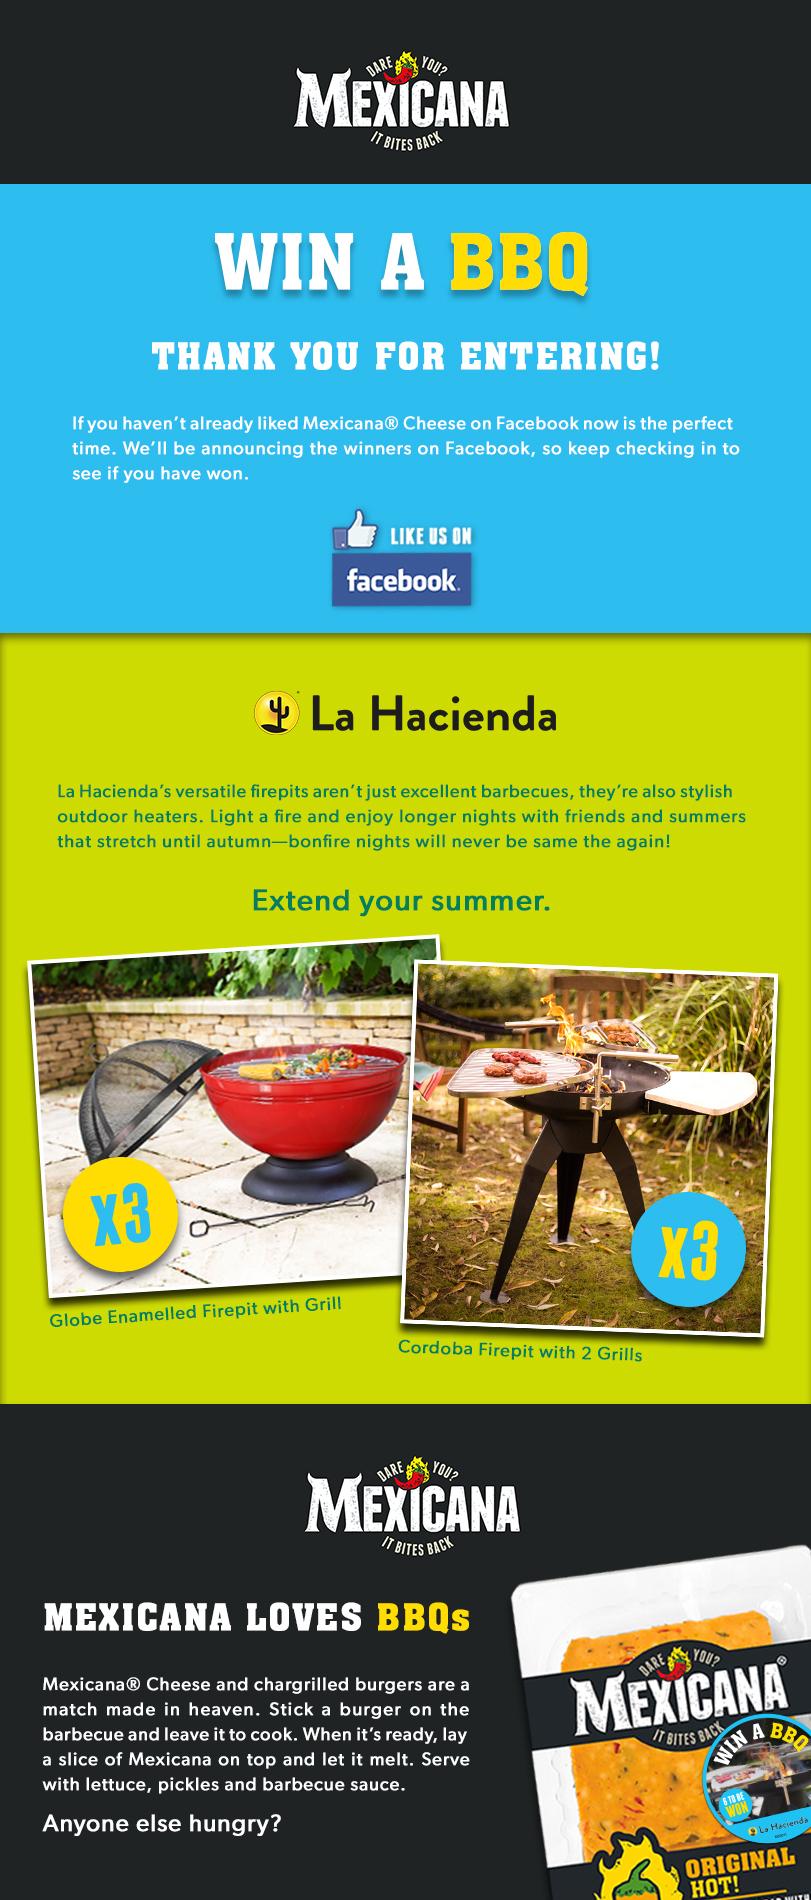 Mexicana_Web Page2.jpg